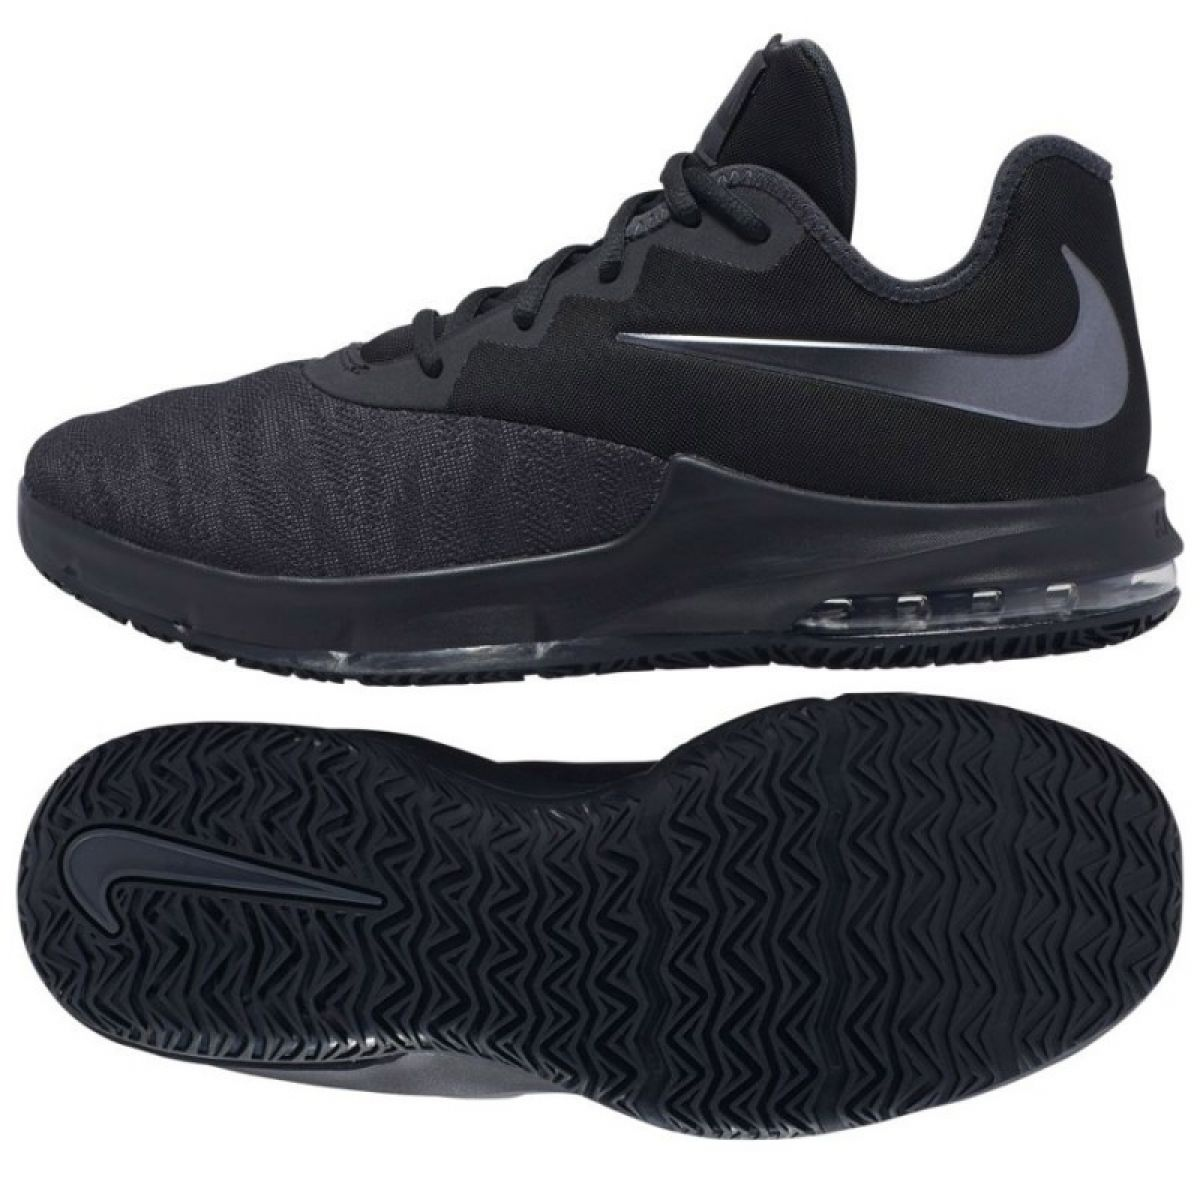 Details zu Nike Air Max Infuriate Iii Low WM AJ5898 007 shoes black